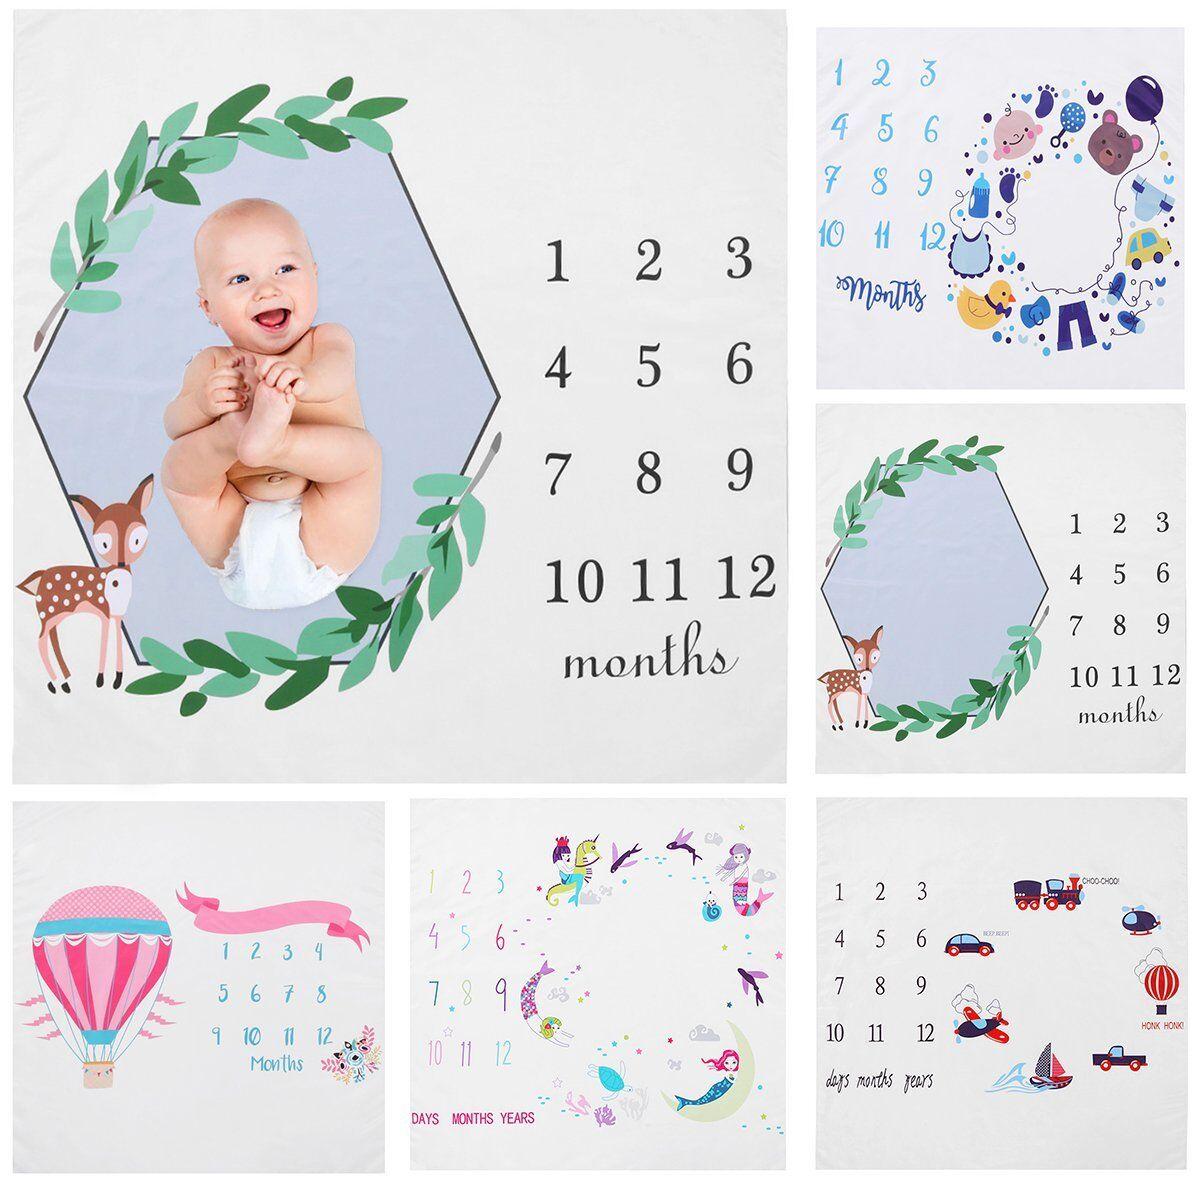 Baby Photography Blanket Newborn Warm Infant Month Growth Recording Milestone